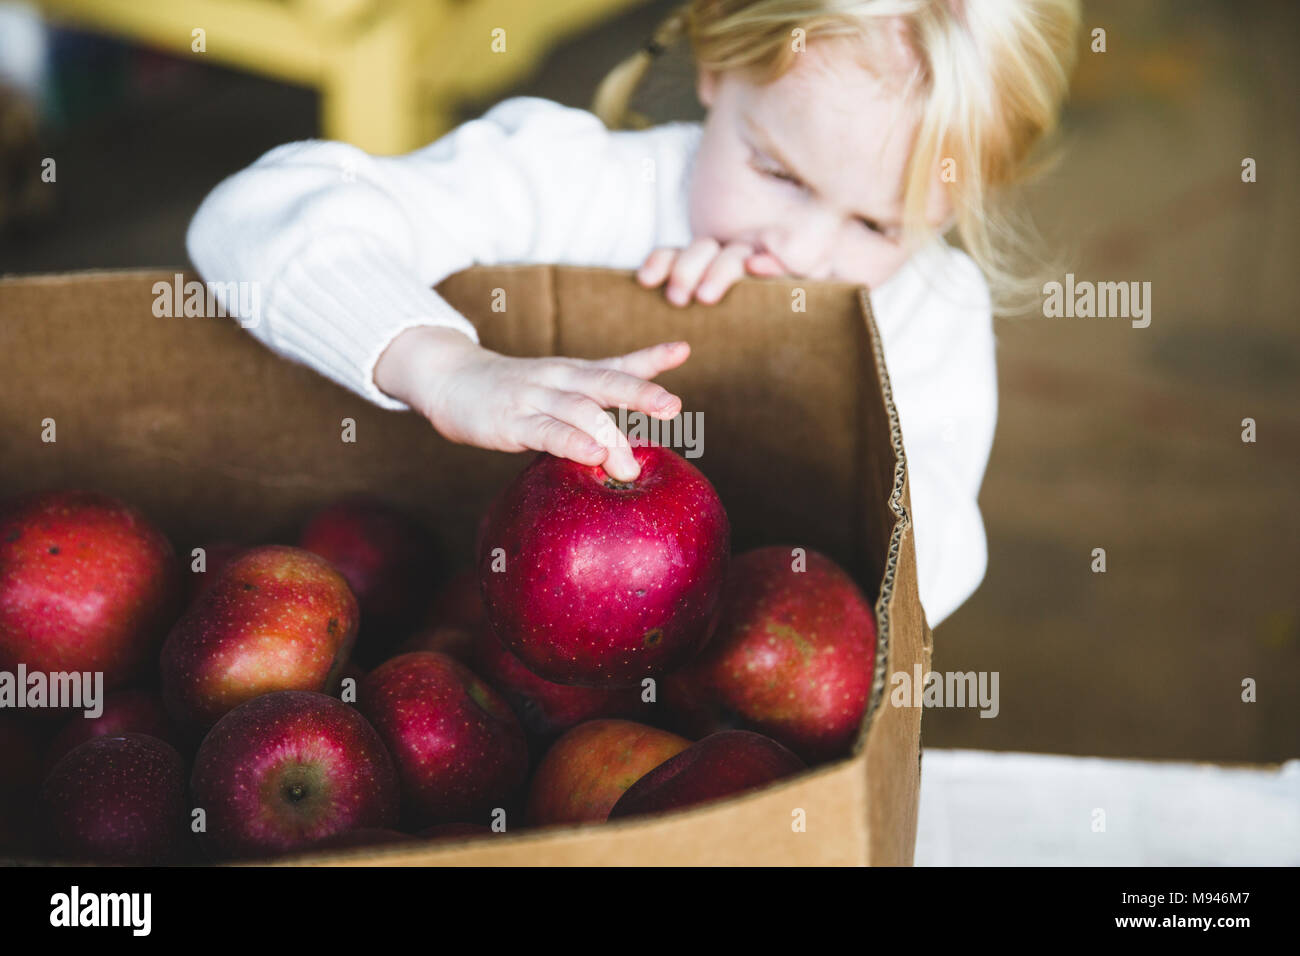 Girl picking up apple depuis fort Photo Stock